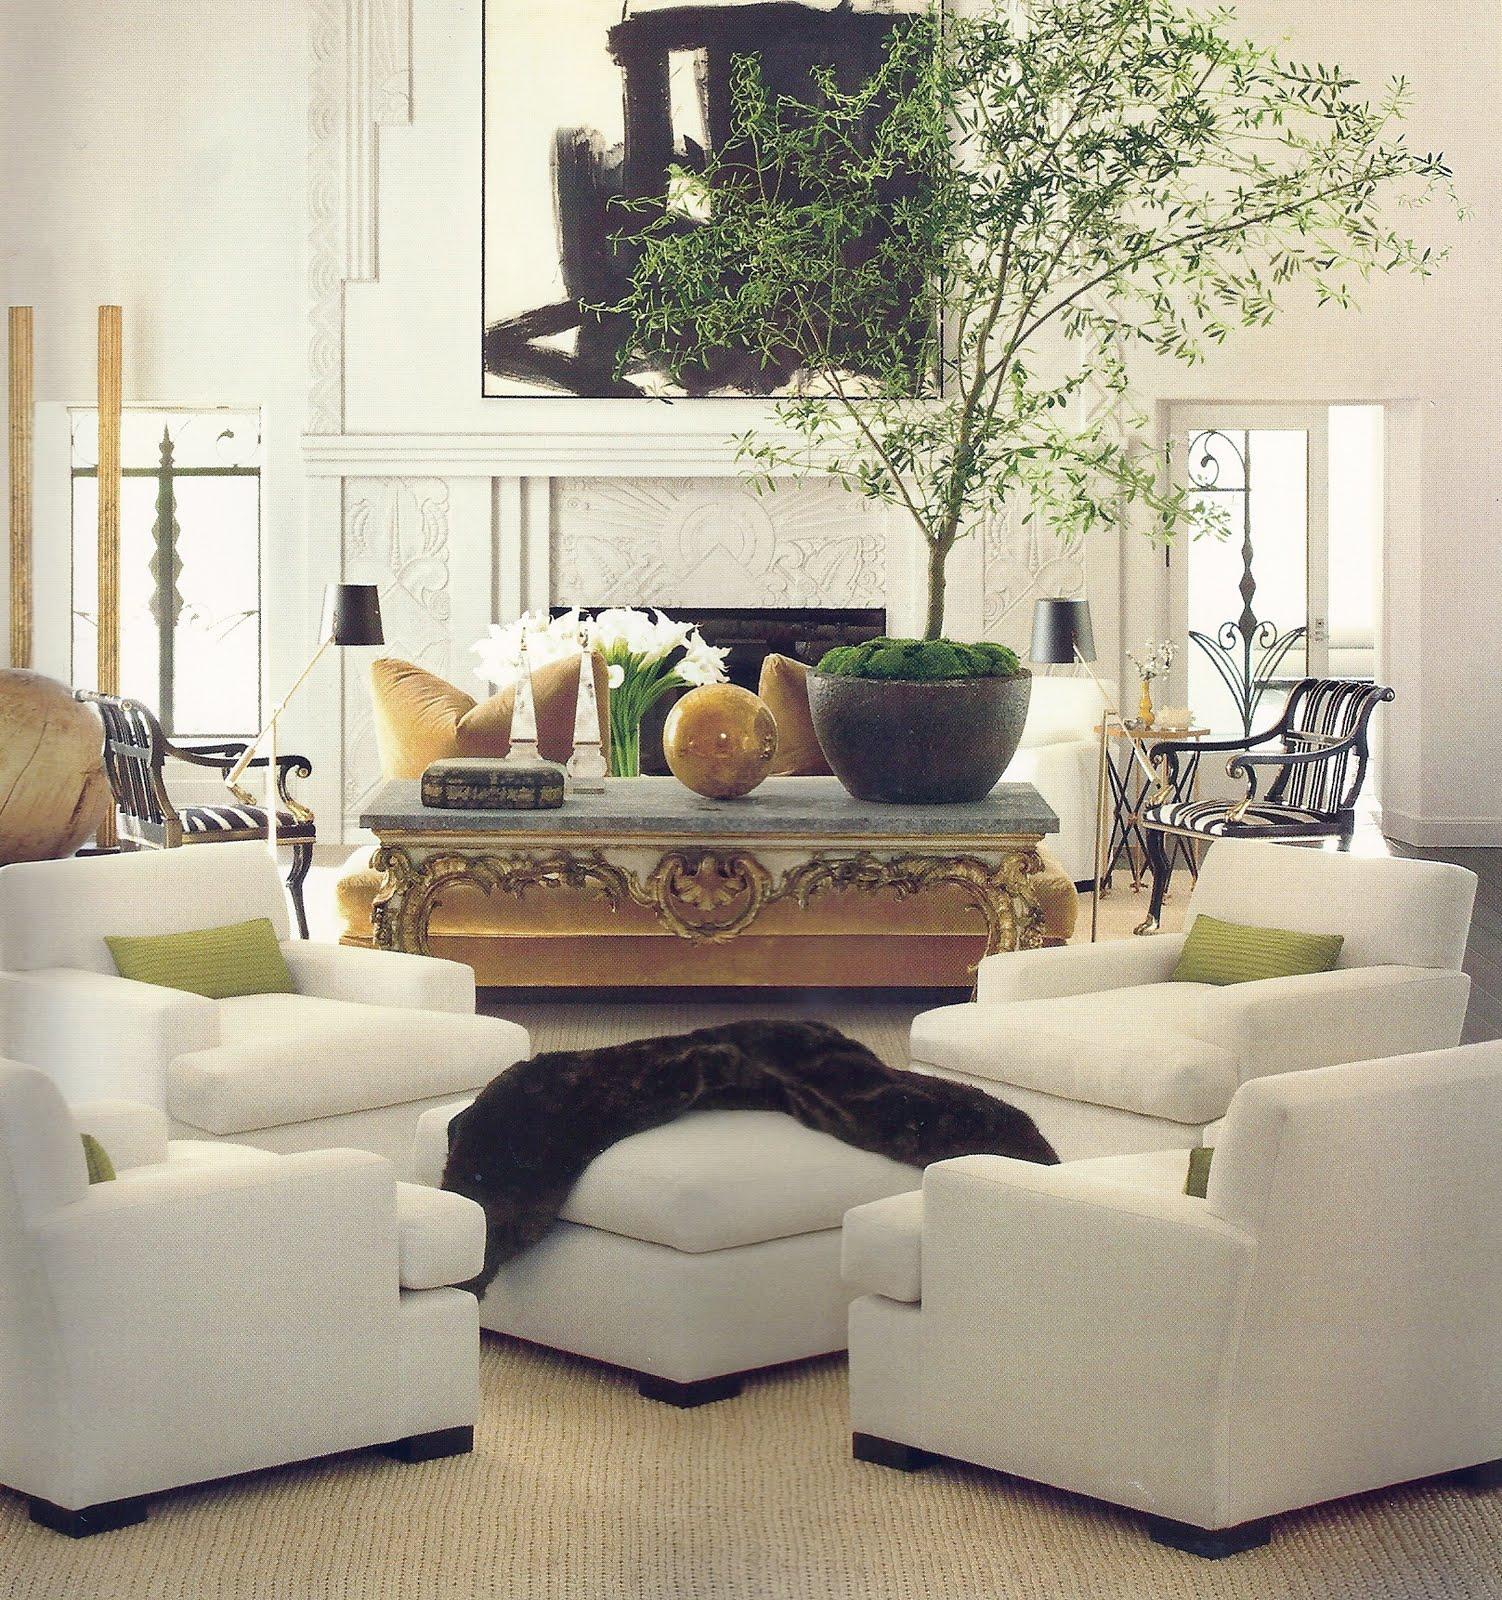 Splendid sass richard hallberg in los angeles for Richard hallberg interior design